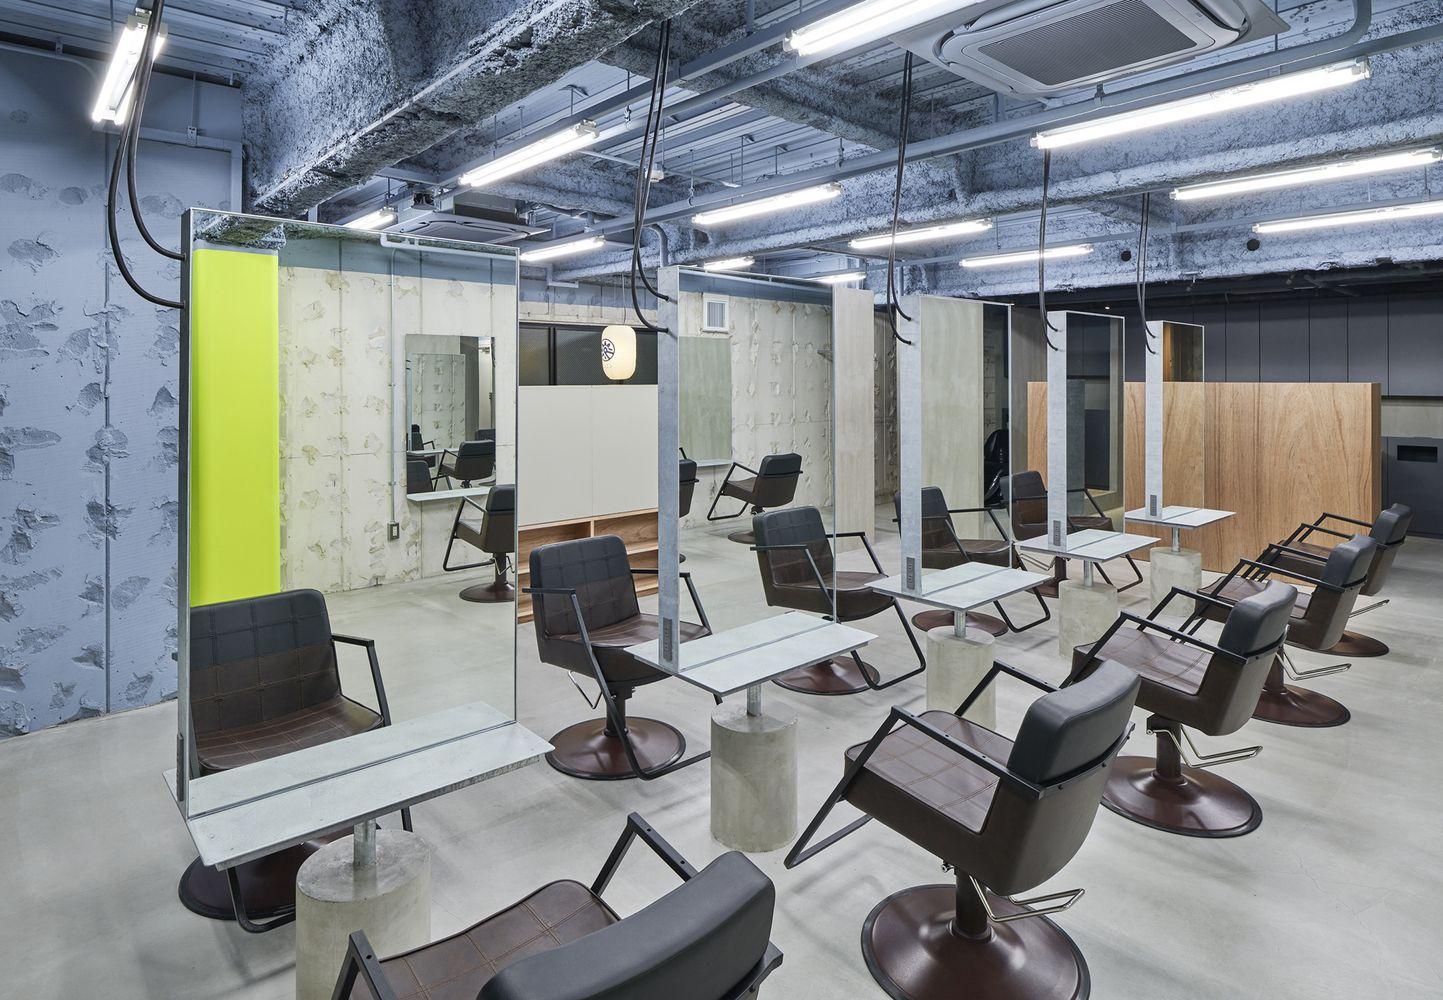 Gallery Of Rowen Esaka Salon Naoya Matsumoto Design 18 Design Decor Salons